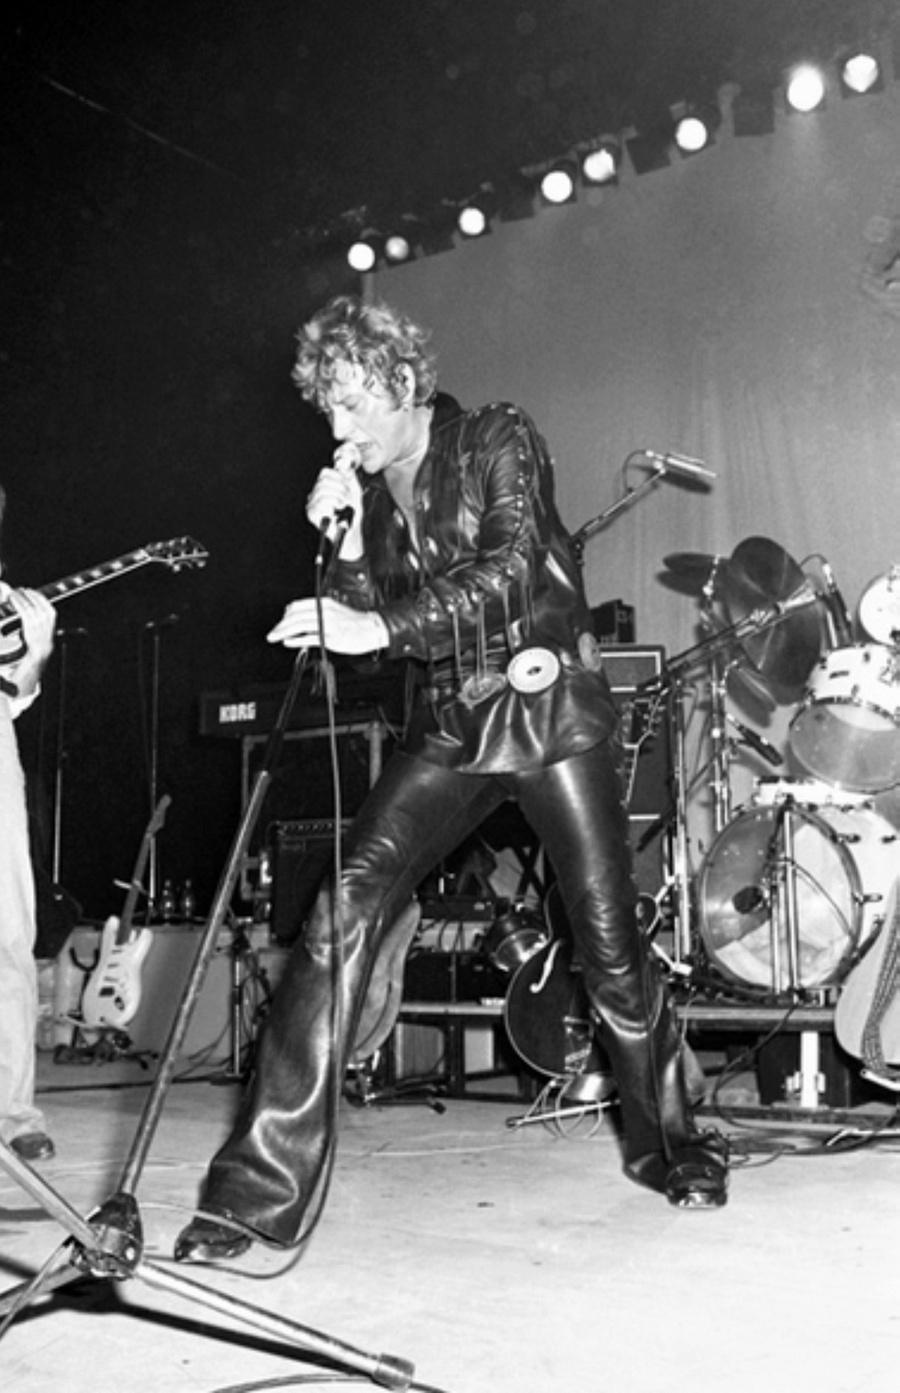 LES CONCERTS DE JOHNNY 'TOURNEE NIGHT RIDER BAND TOUR 1981' Captu895